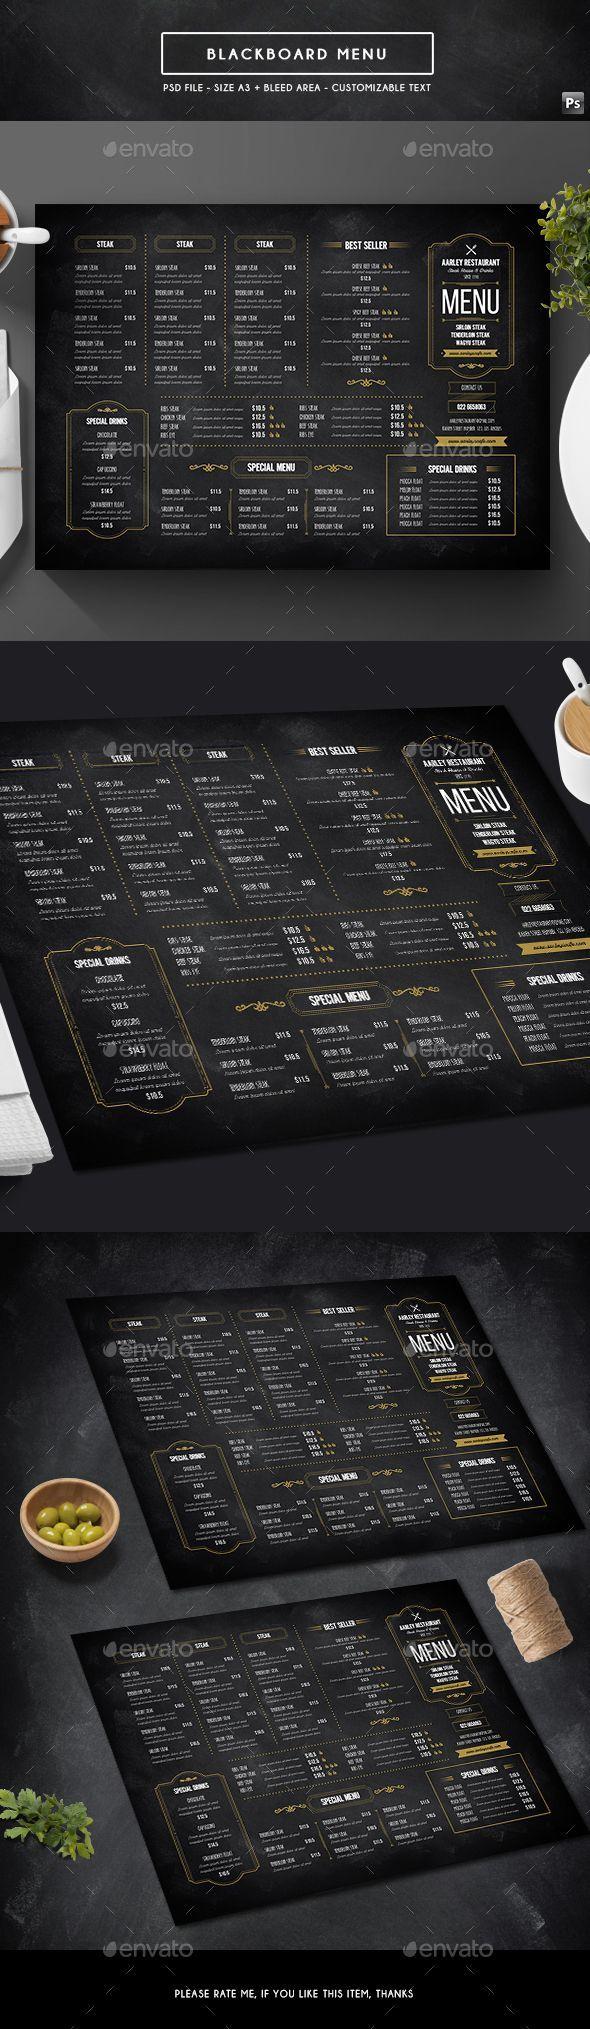 Blackboard Menu - Food Menus Print Templates Download here : https://graphicriver.net/item/blackboard-menu/19243486?s_rank=91&ref=Al-fatih